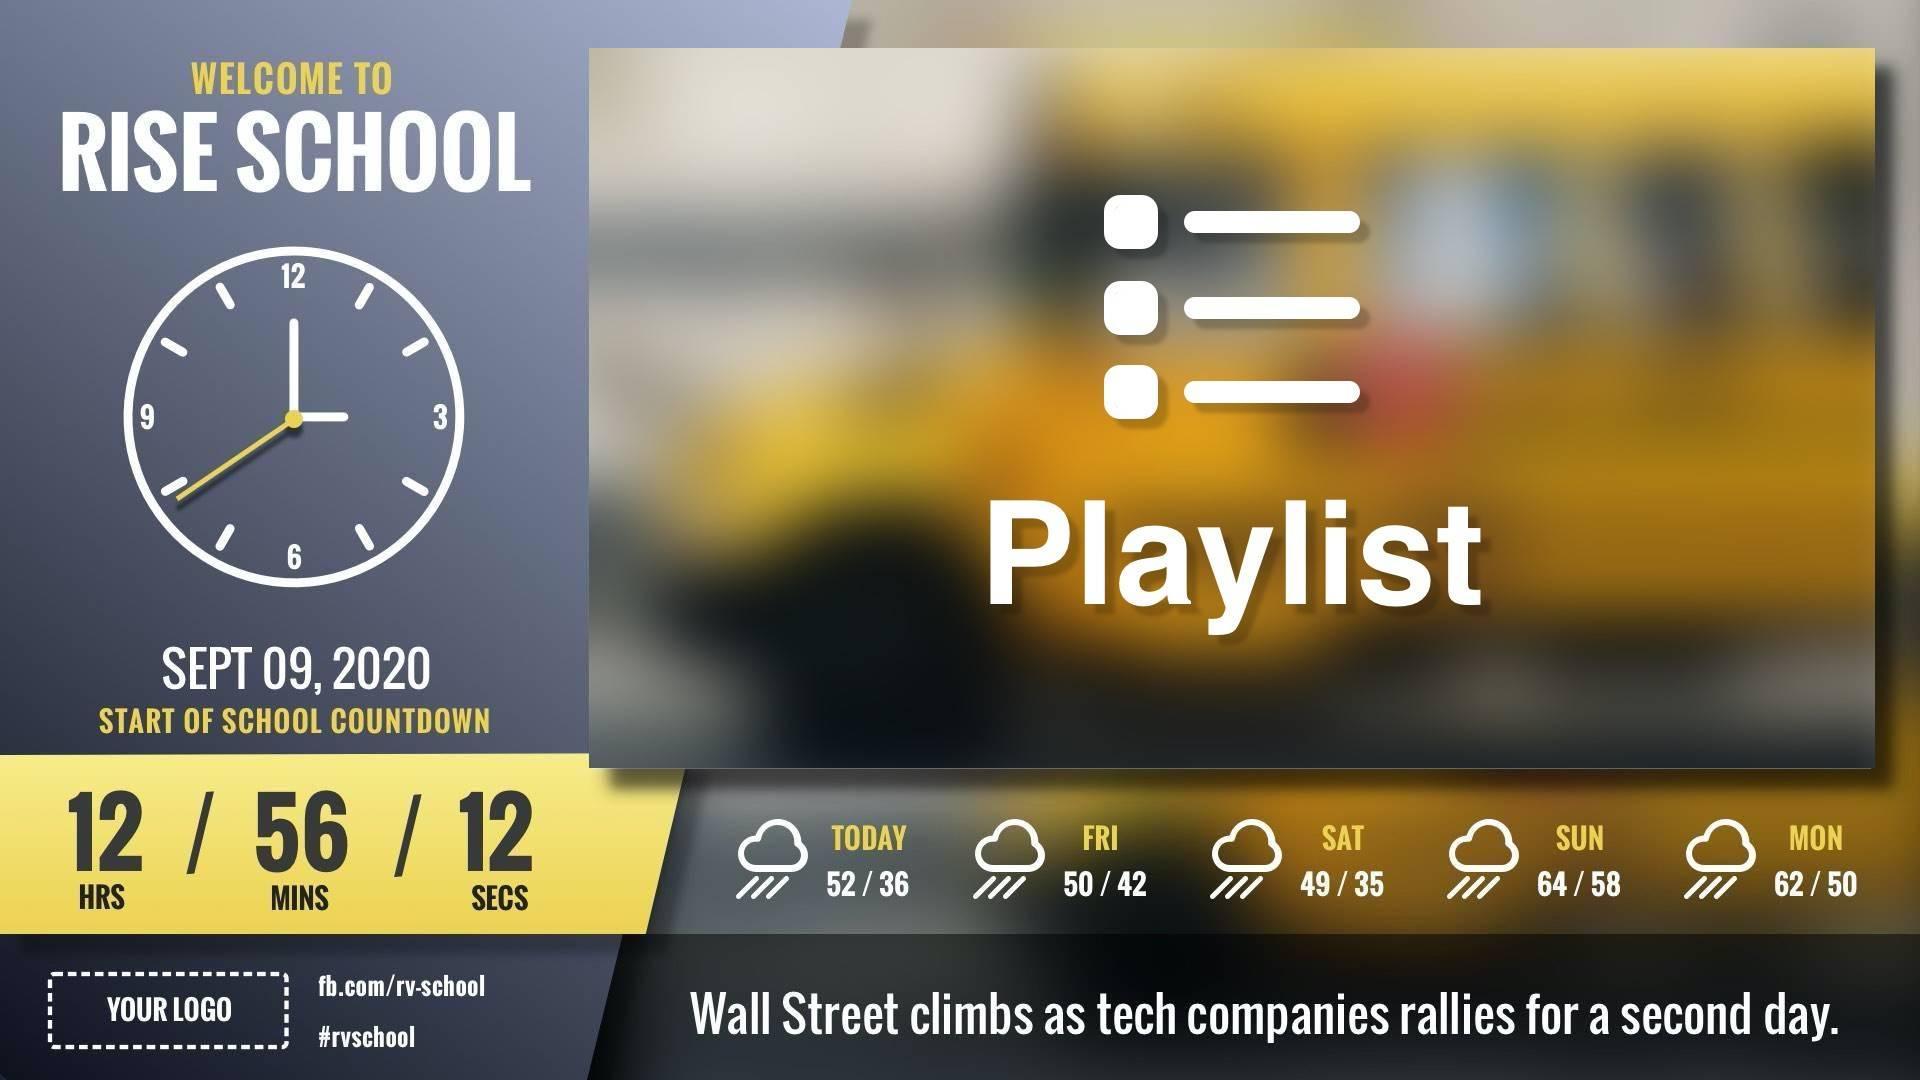 Zoned Playlist School Slant Digital Signage Template